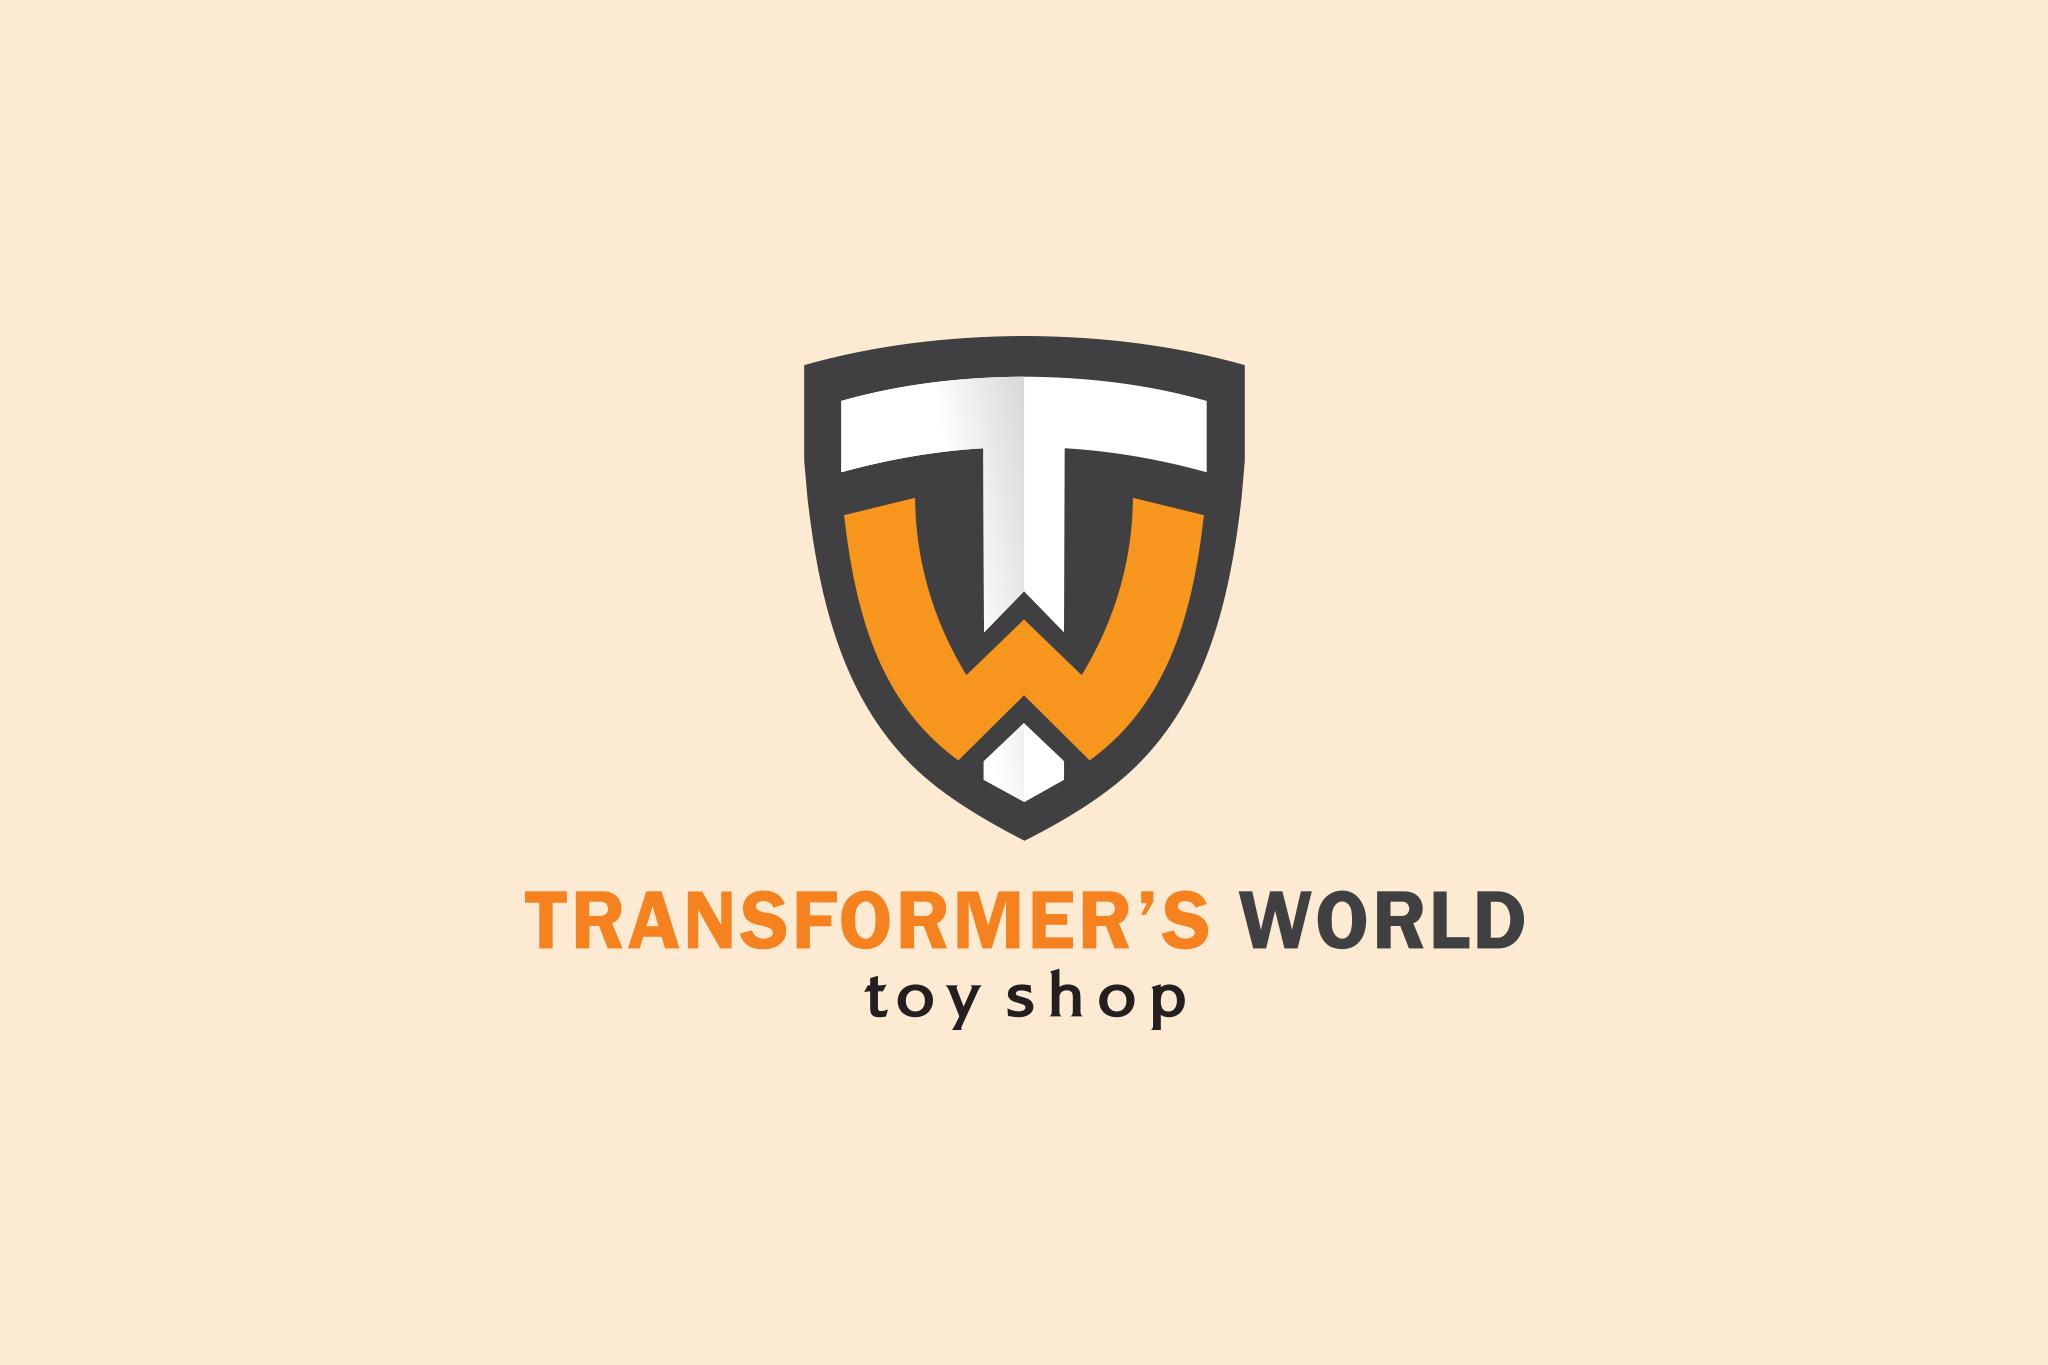 THIẾT KẾ LOGO TRANSFORMER'S WORLD - TOY STORE